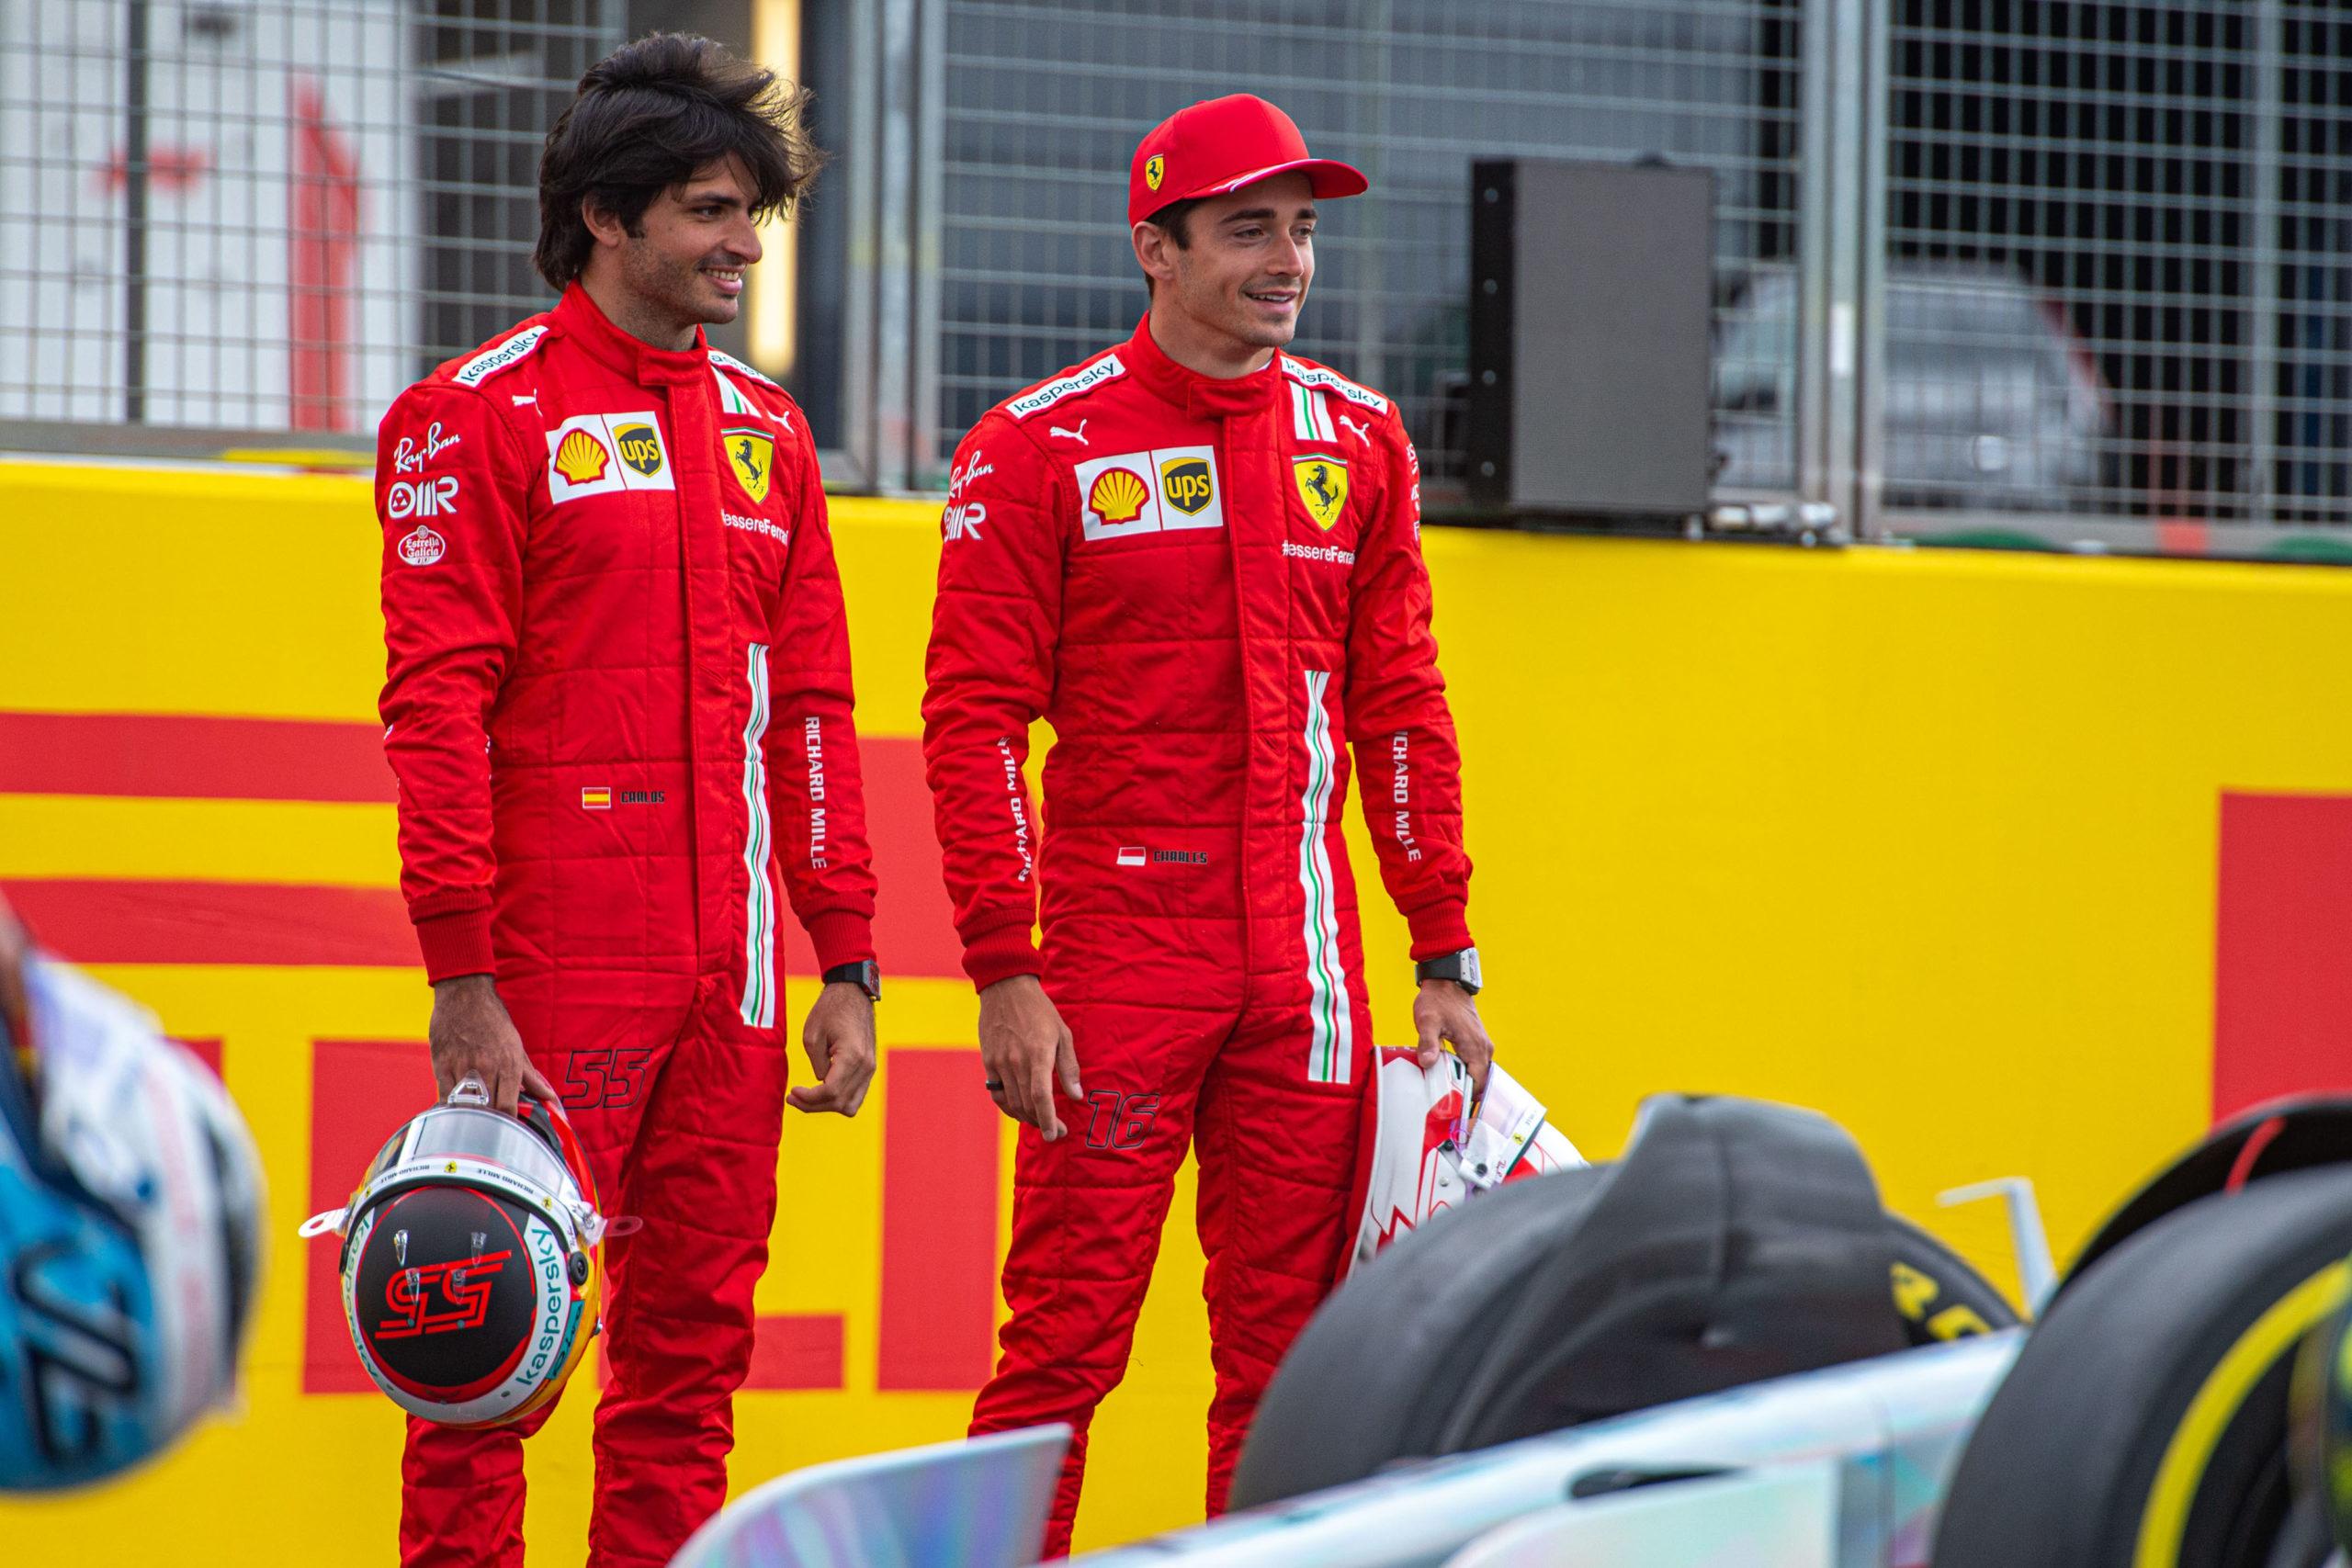 Carlos Sainz and Charles Leclerc, Ferrari, GP GRAN BRETAGNA F1/2021 - GIOVEDÌ 15/07/2021   credit: @Scuderia Ferrari Press Office